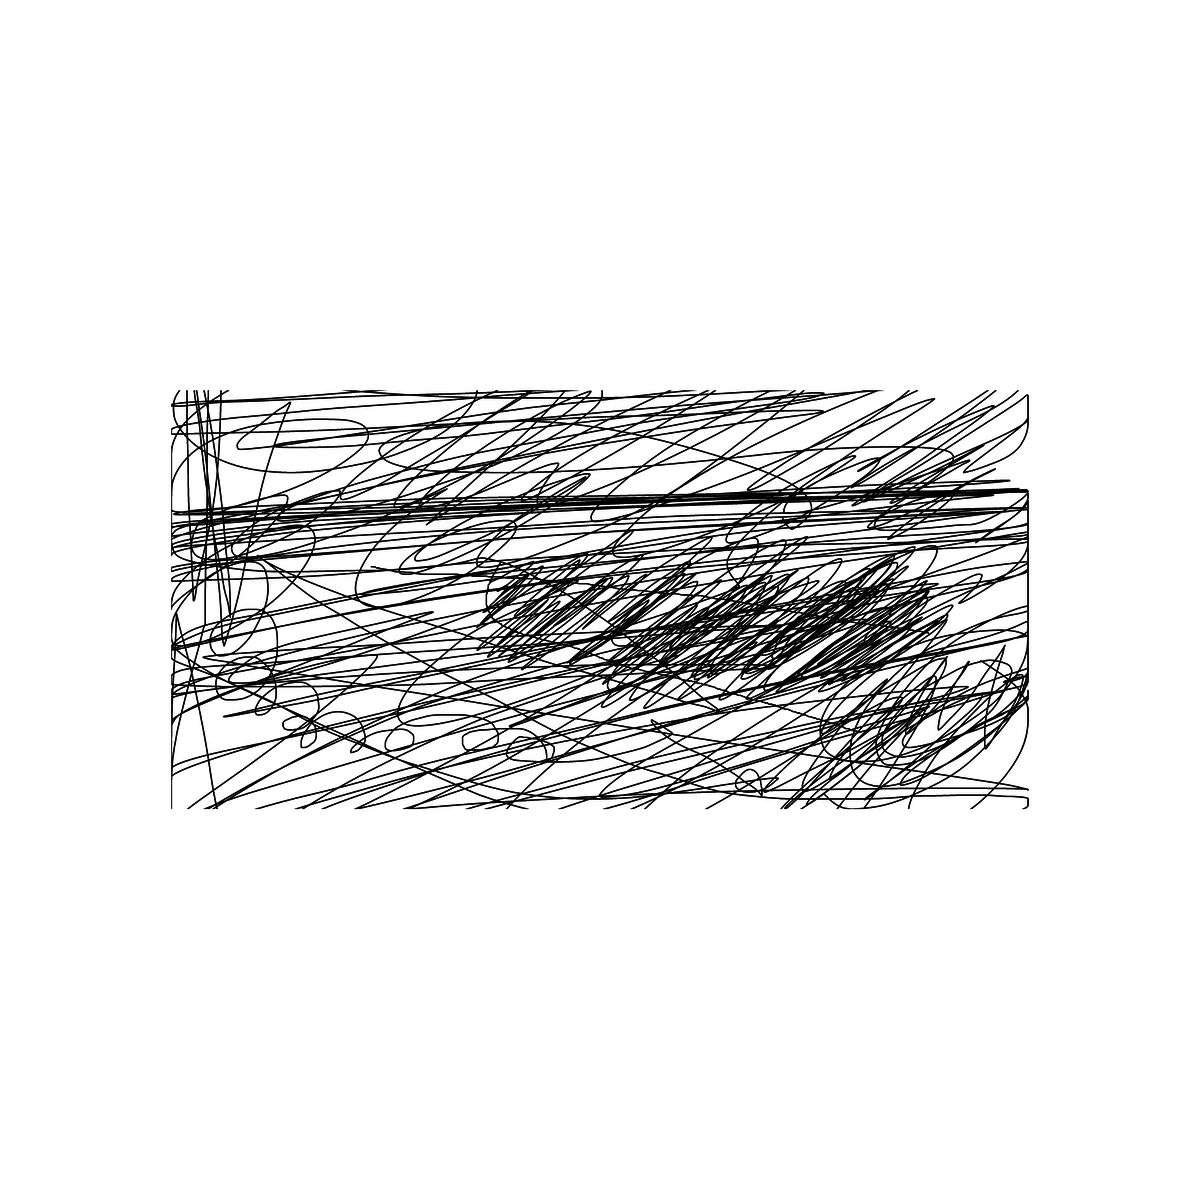 BAAAM drawing#14390 lat:50.3451080322265600lng: 16.1457996368408200